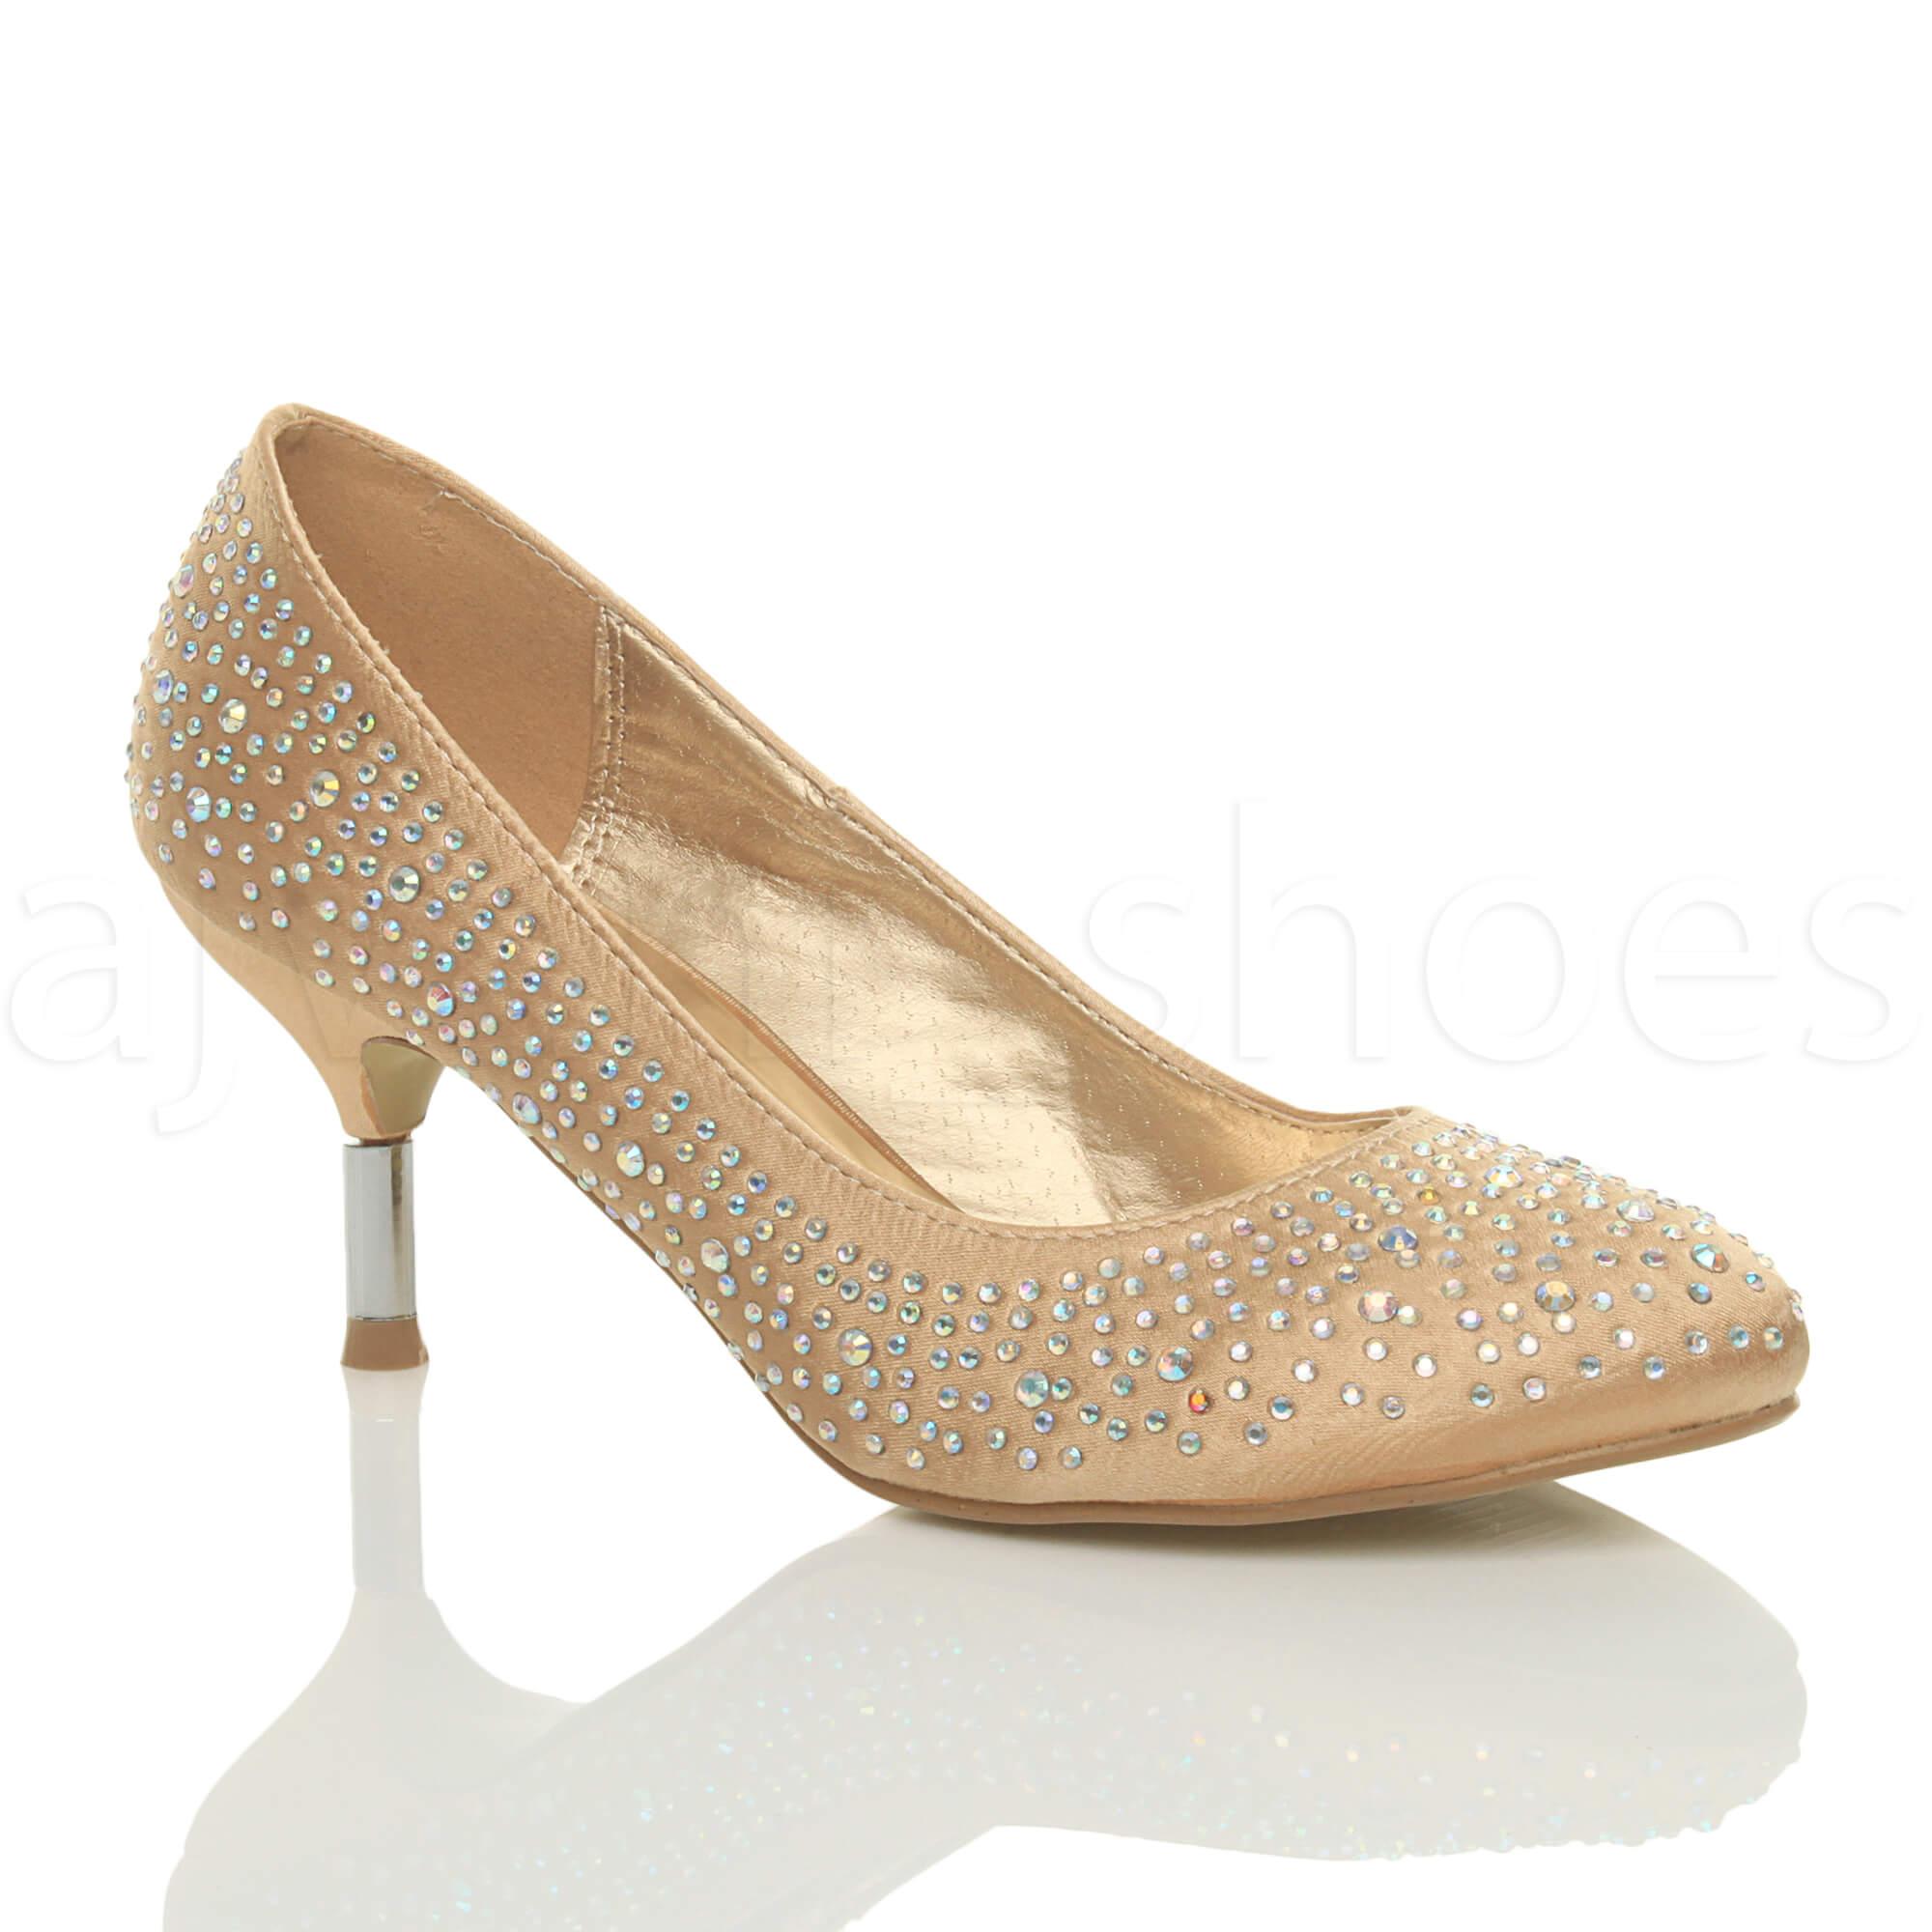 Womens Wedding Shoes: WOMENS LADIES MID KITTEN HEEL WEDDING BRIDESMAID PROM